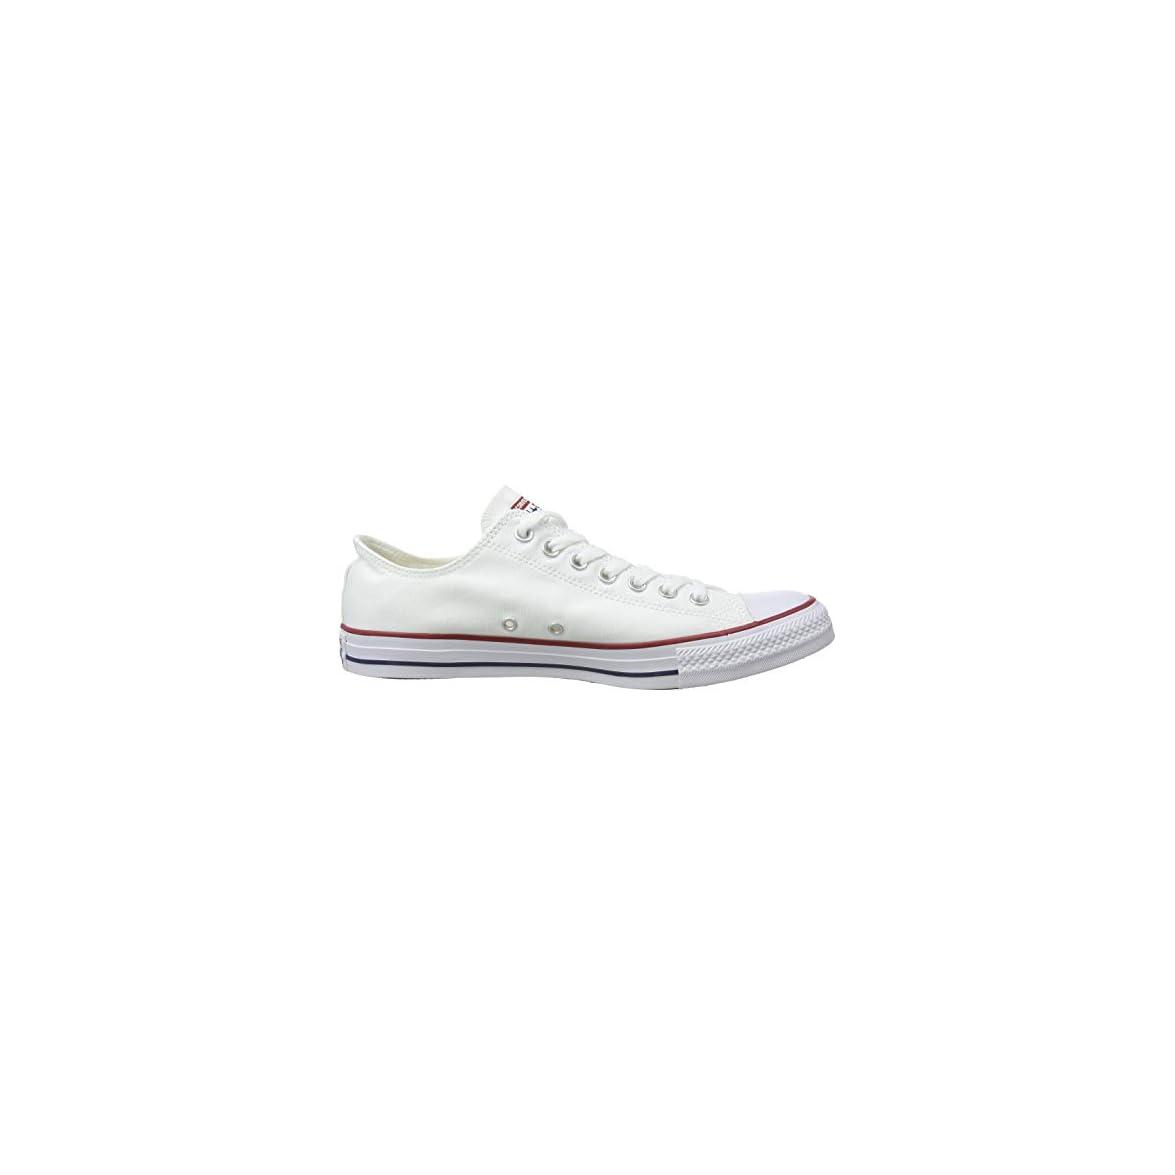 Converse Sneaker Donna Nero nero 7 5 B m Us Women 5 5 D m Men Size 3 5